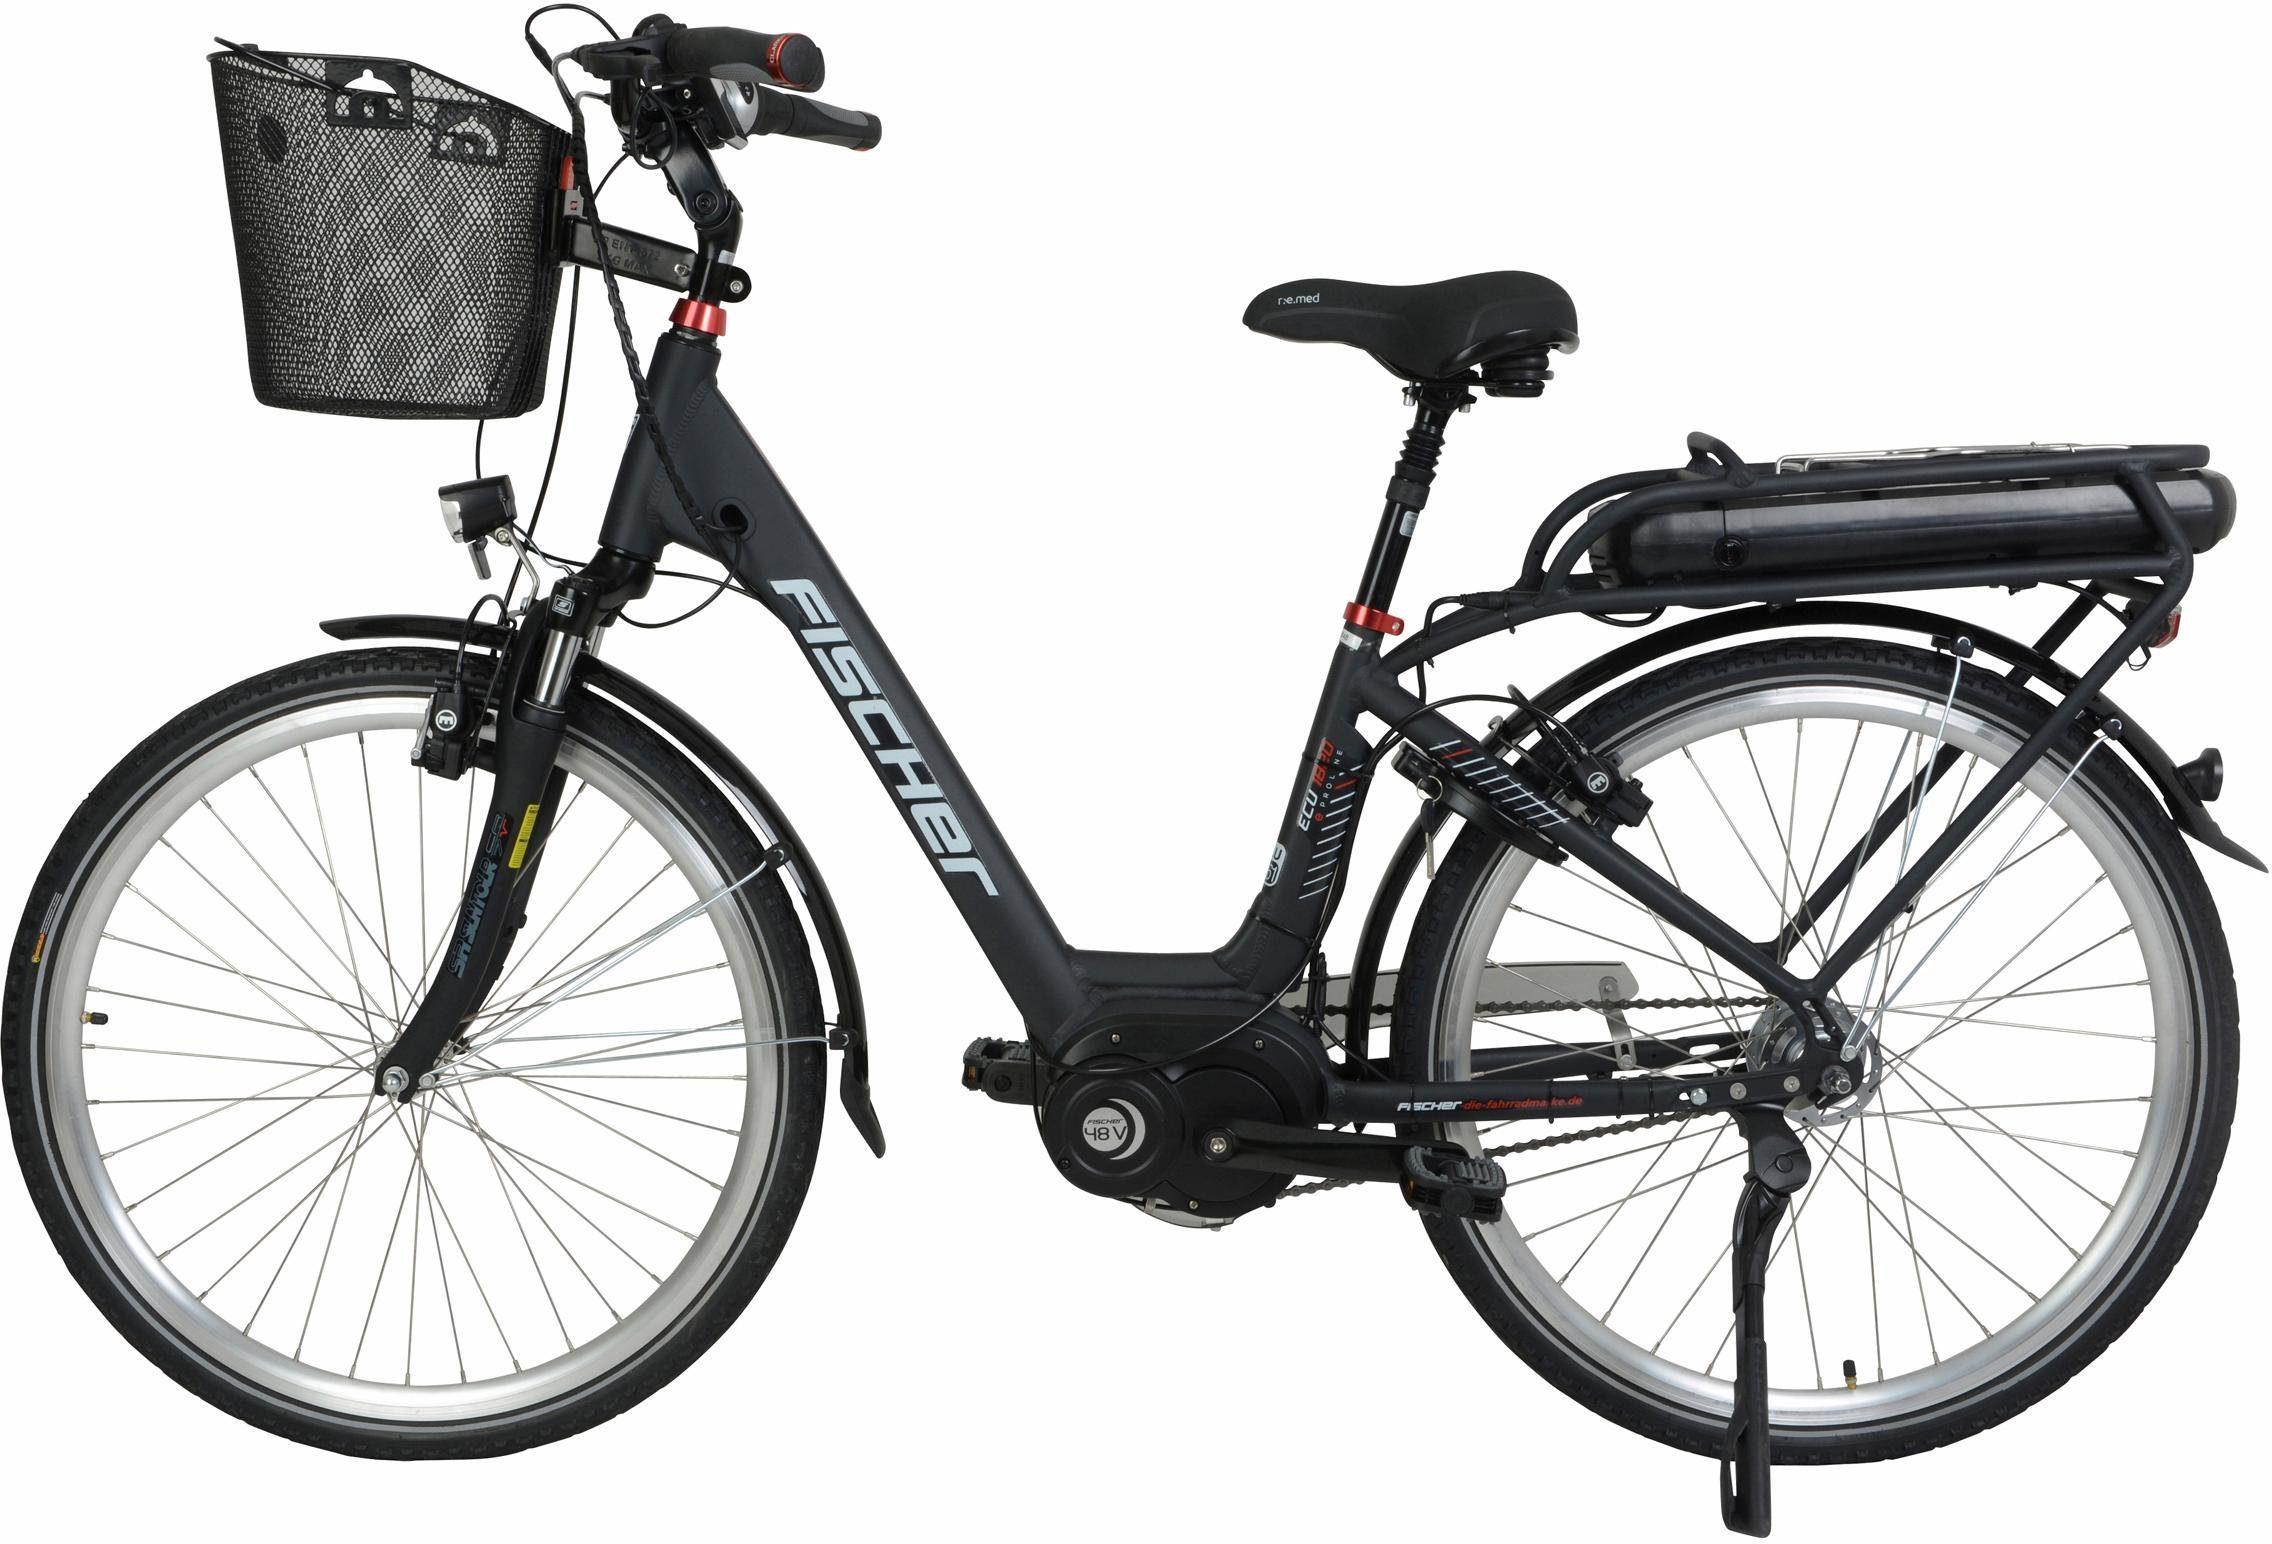 FISCHER City E-Bike, 48 V/250 W Mittelmotor, 28 Z., 7-G.-Shimano Nabenschaltung, »ECU 1820 Ready« Modell 2018